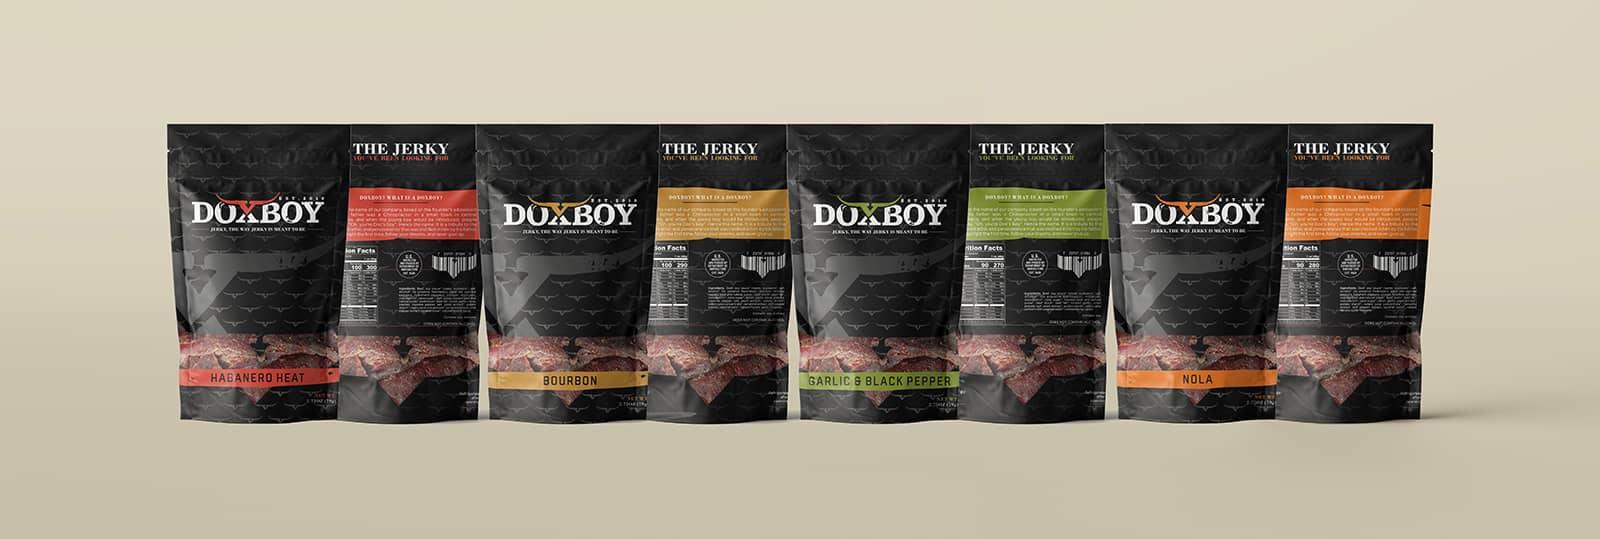 doxboy packaging 4